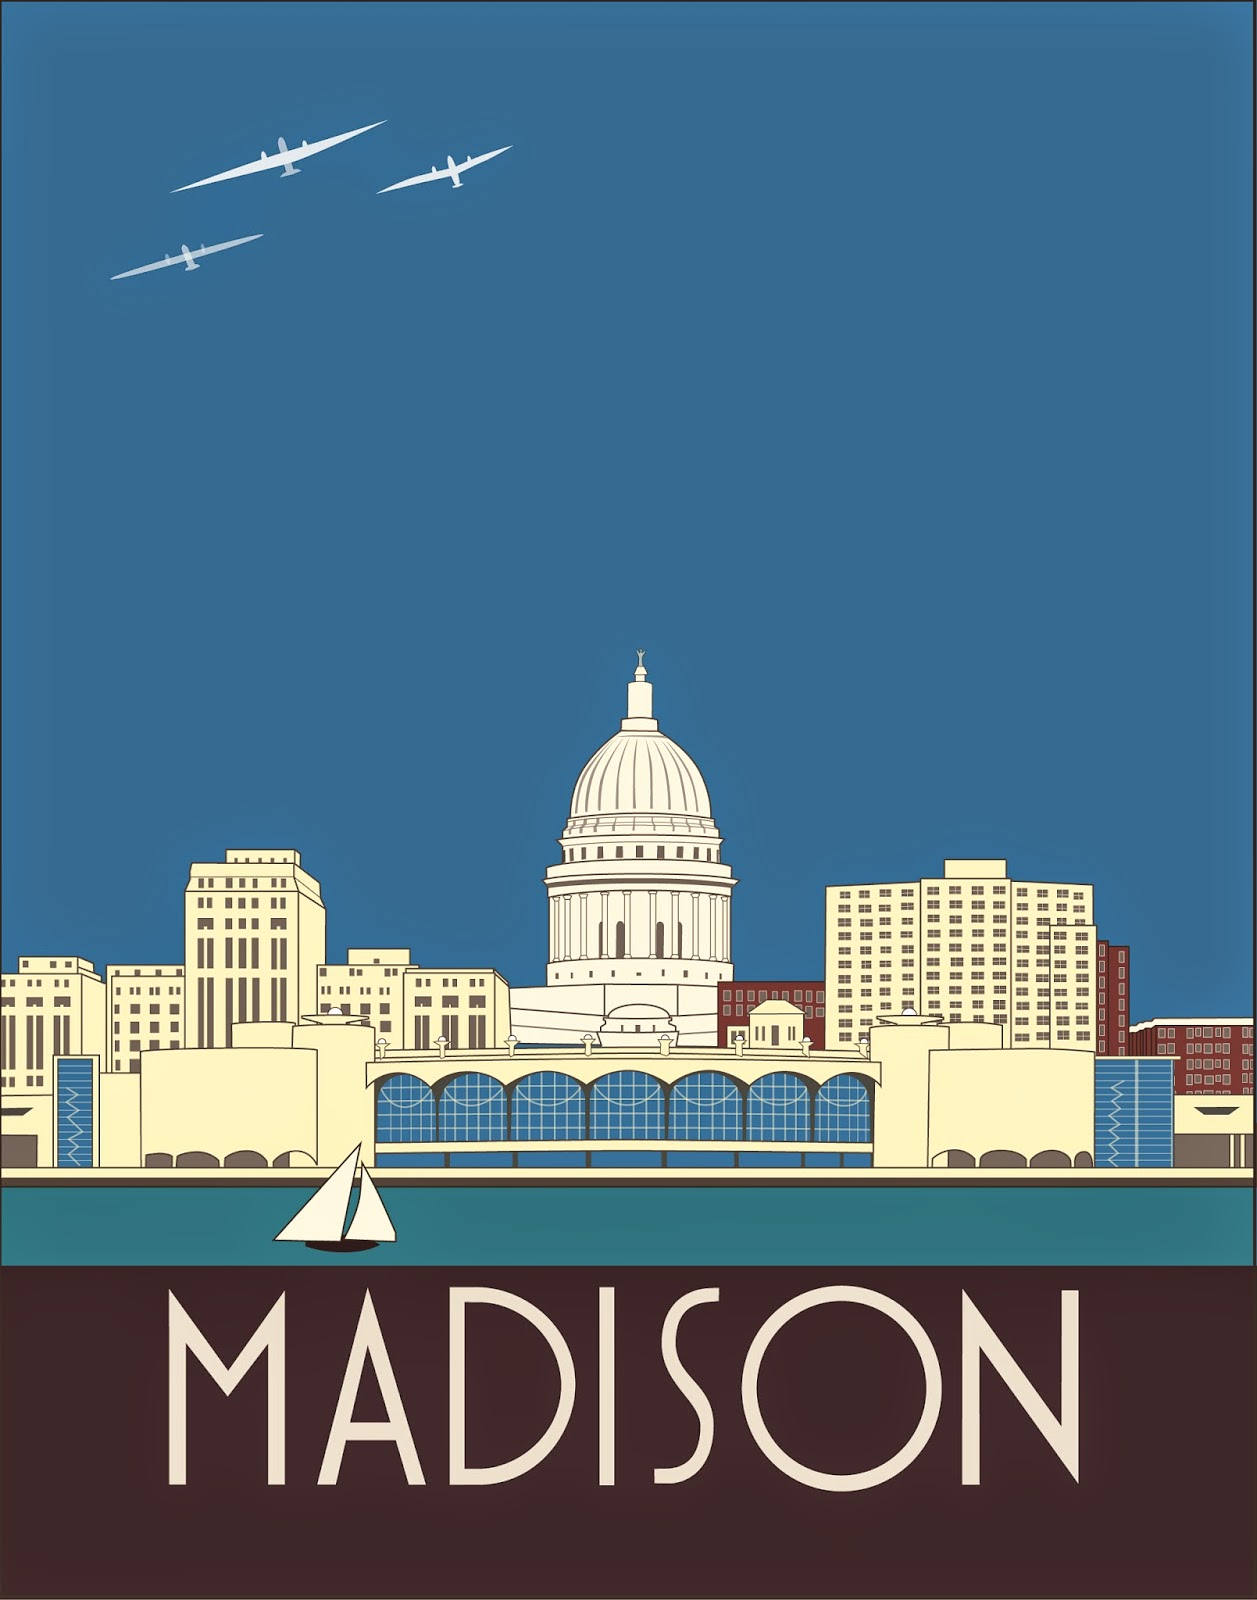 Madison Wisconsin Art Deco Skyline Josef Spalenka adobe illustrator